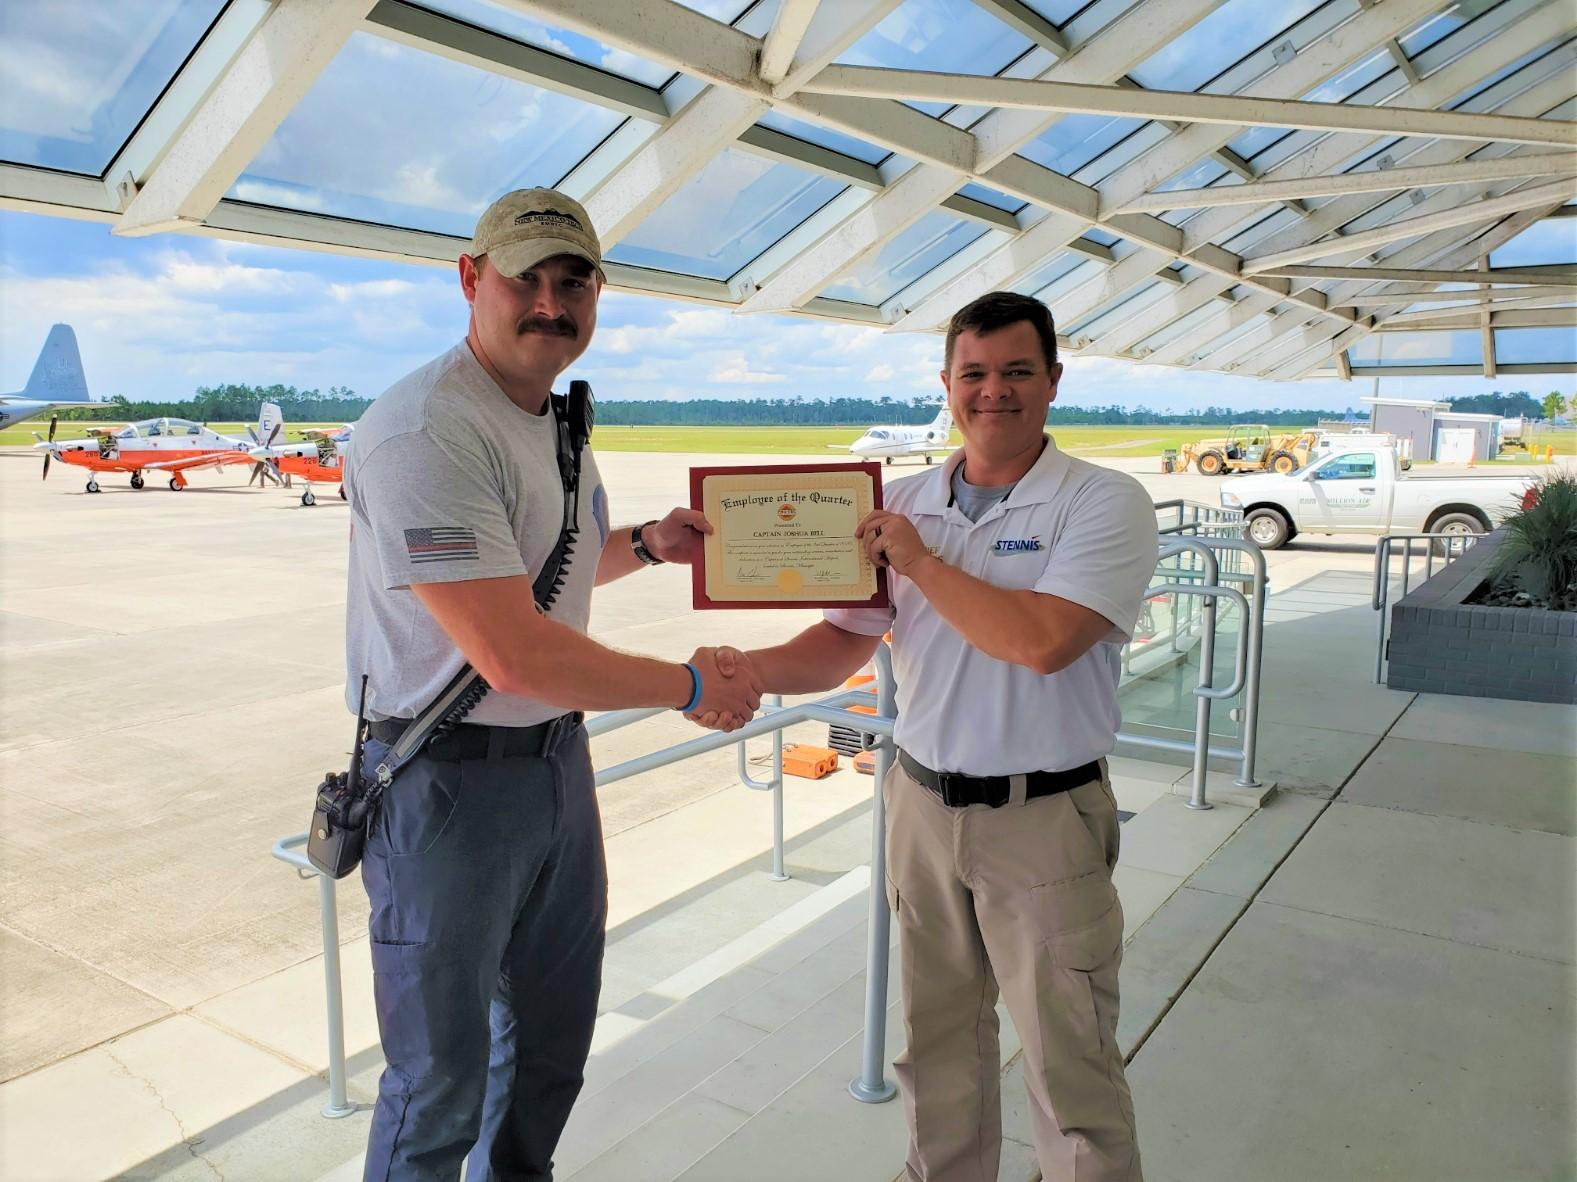 Stennis Captain Awarded Employee of 2nd Quarter